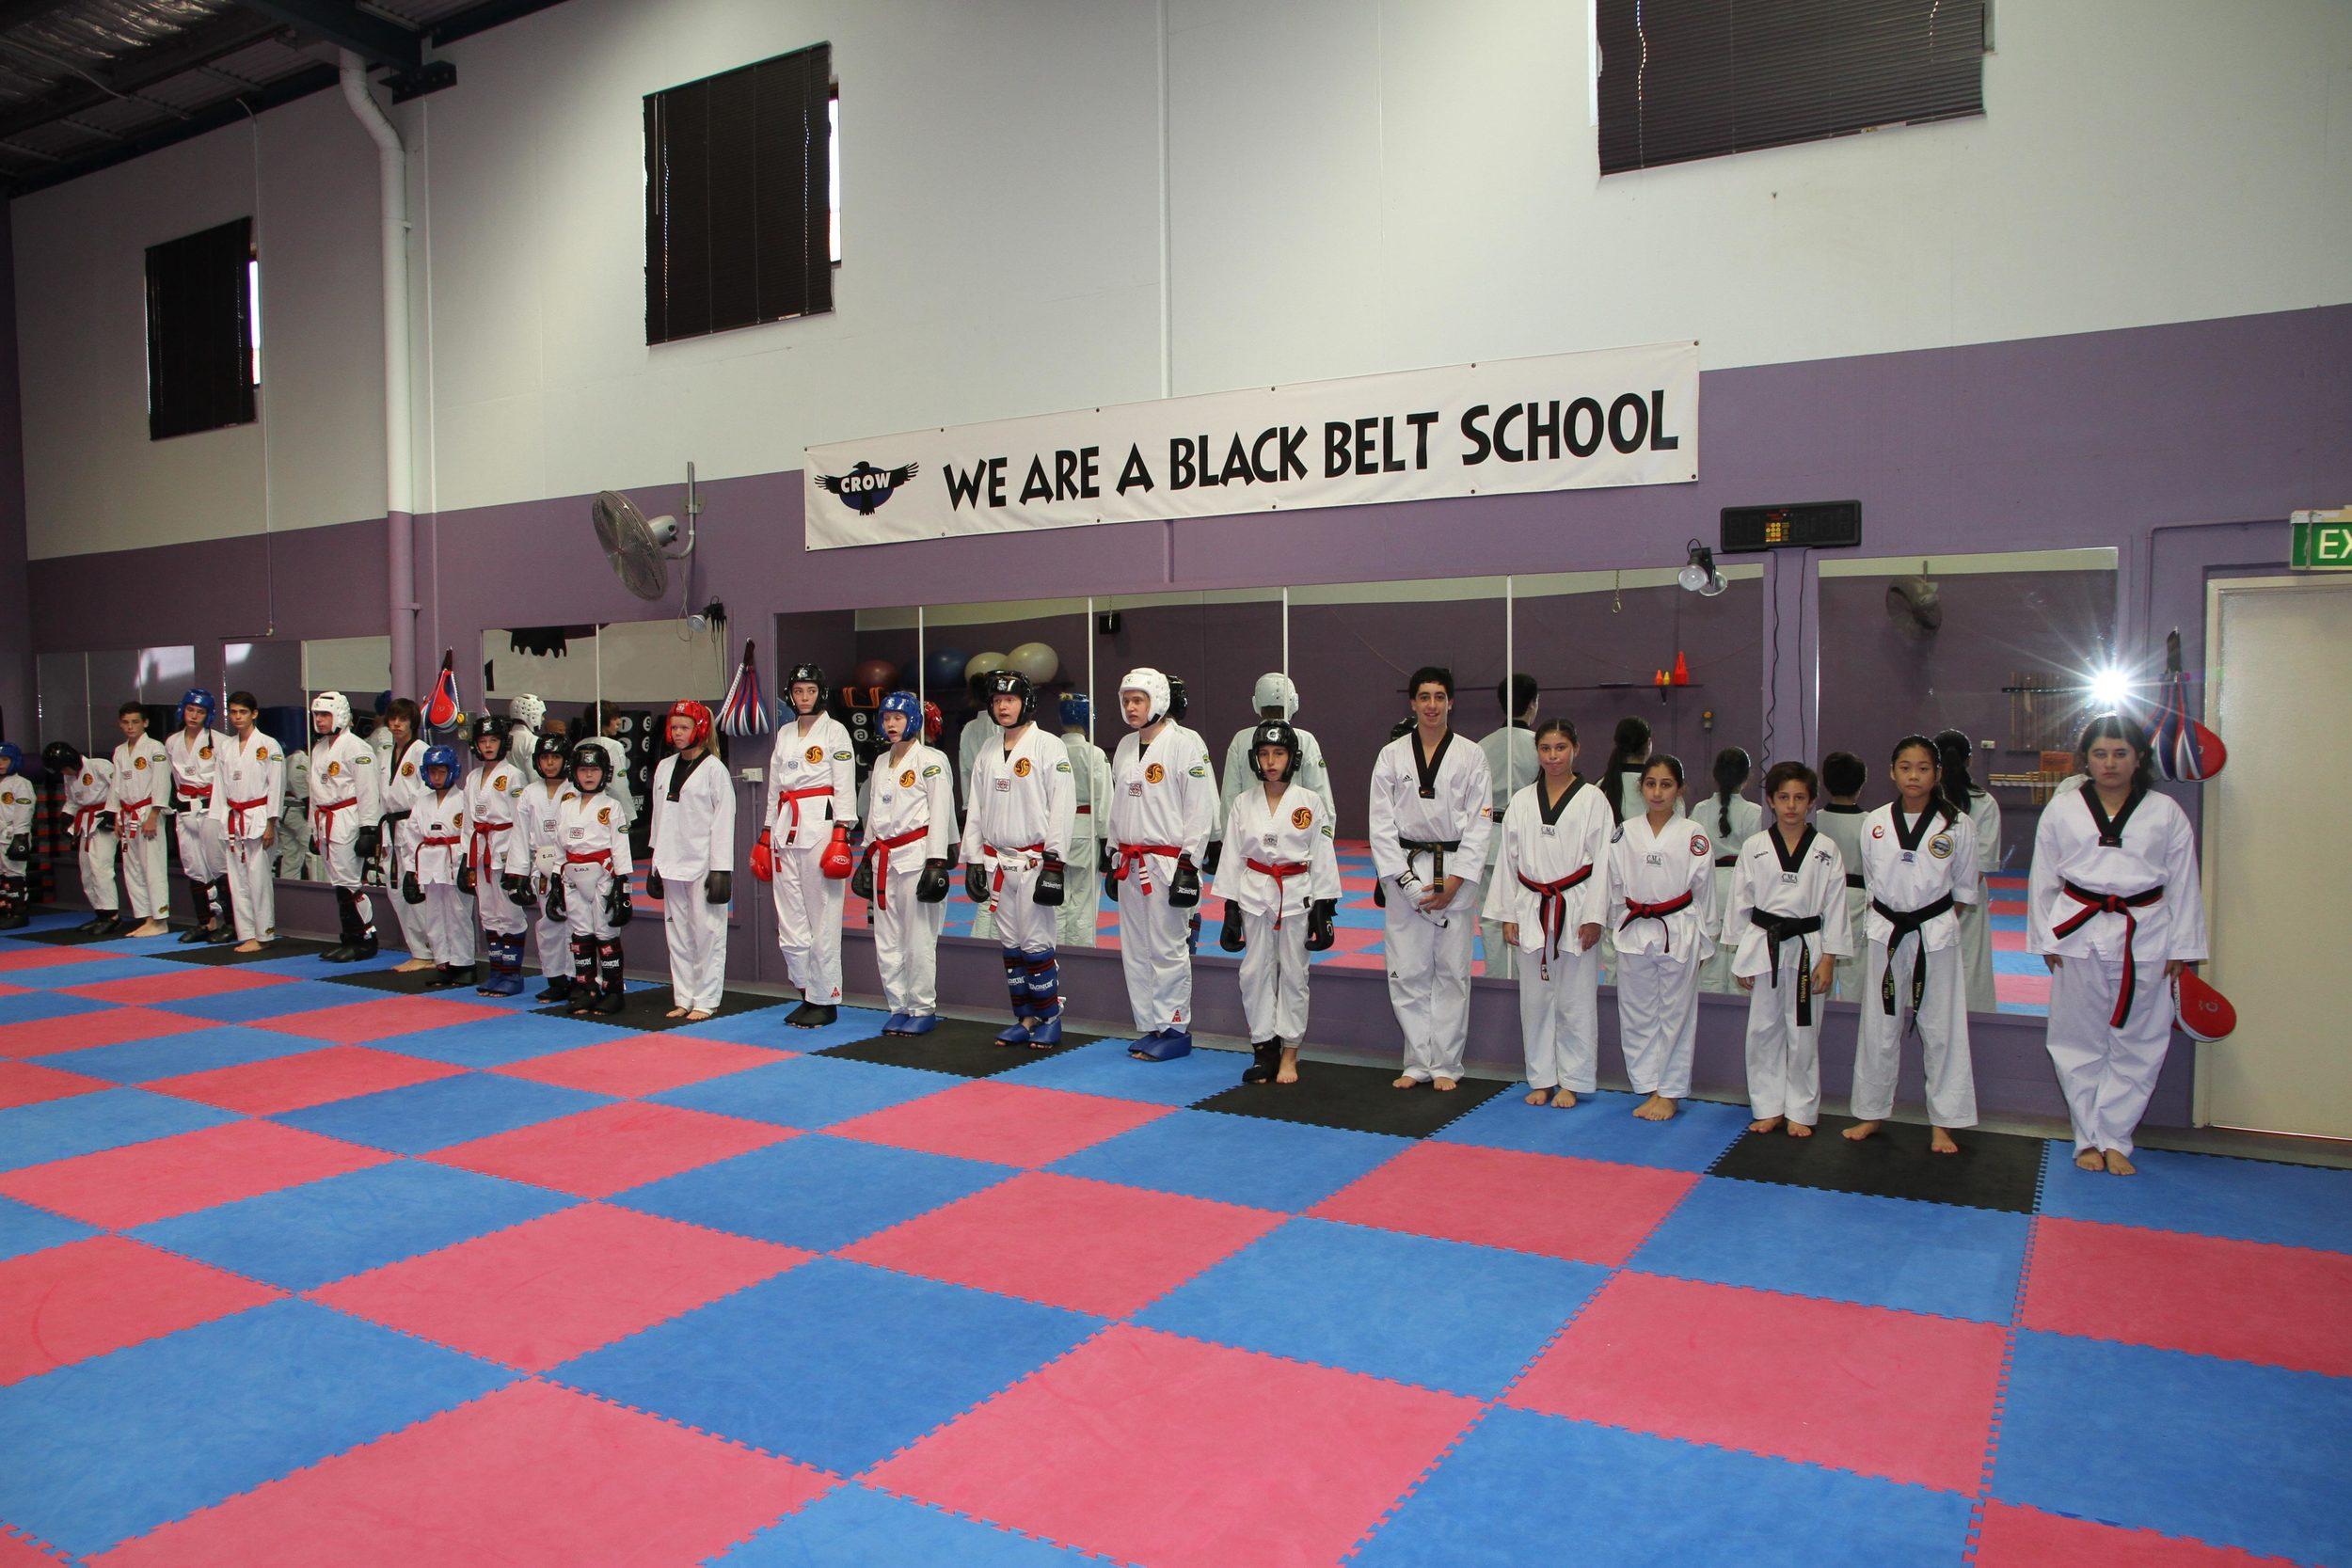 Taekwondo and sparring classes